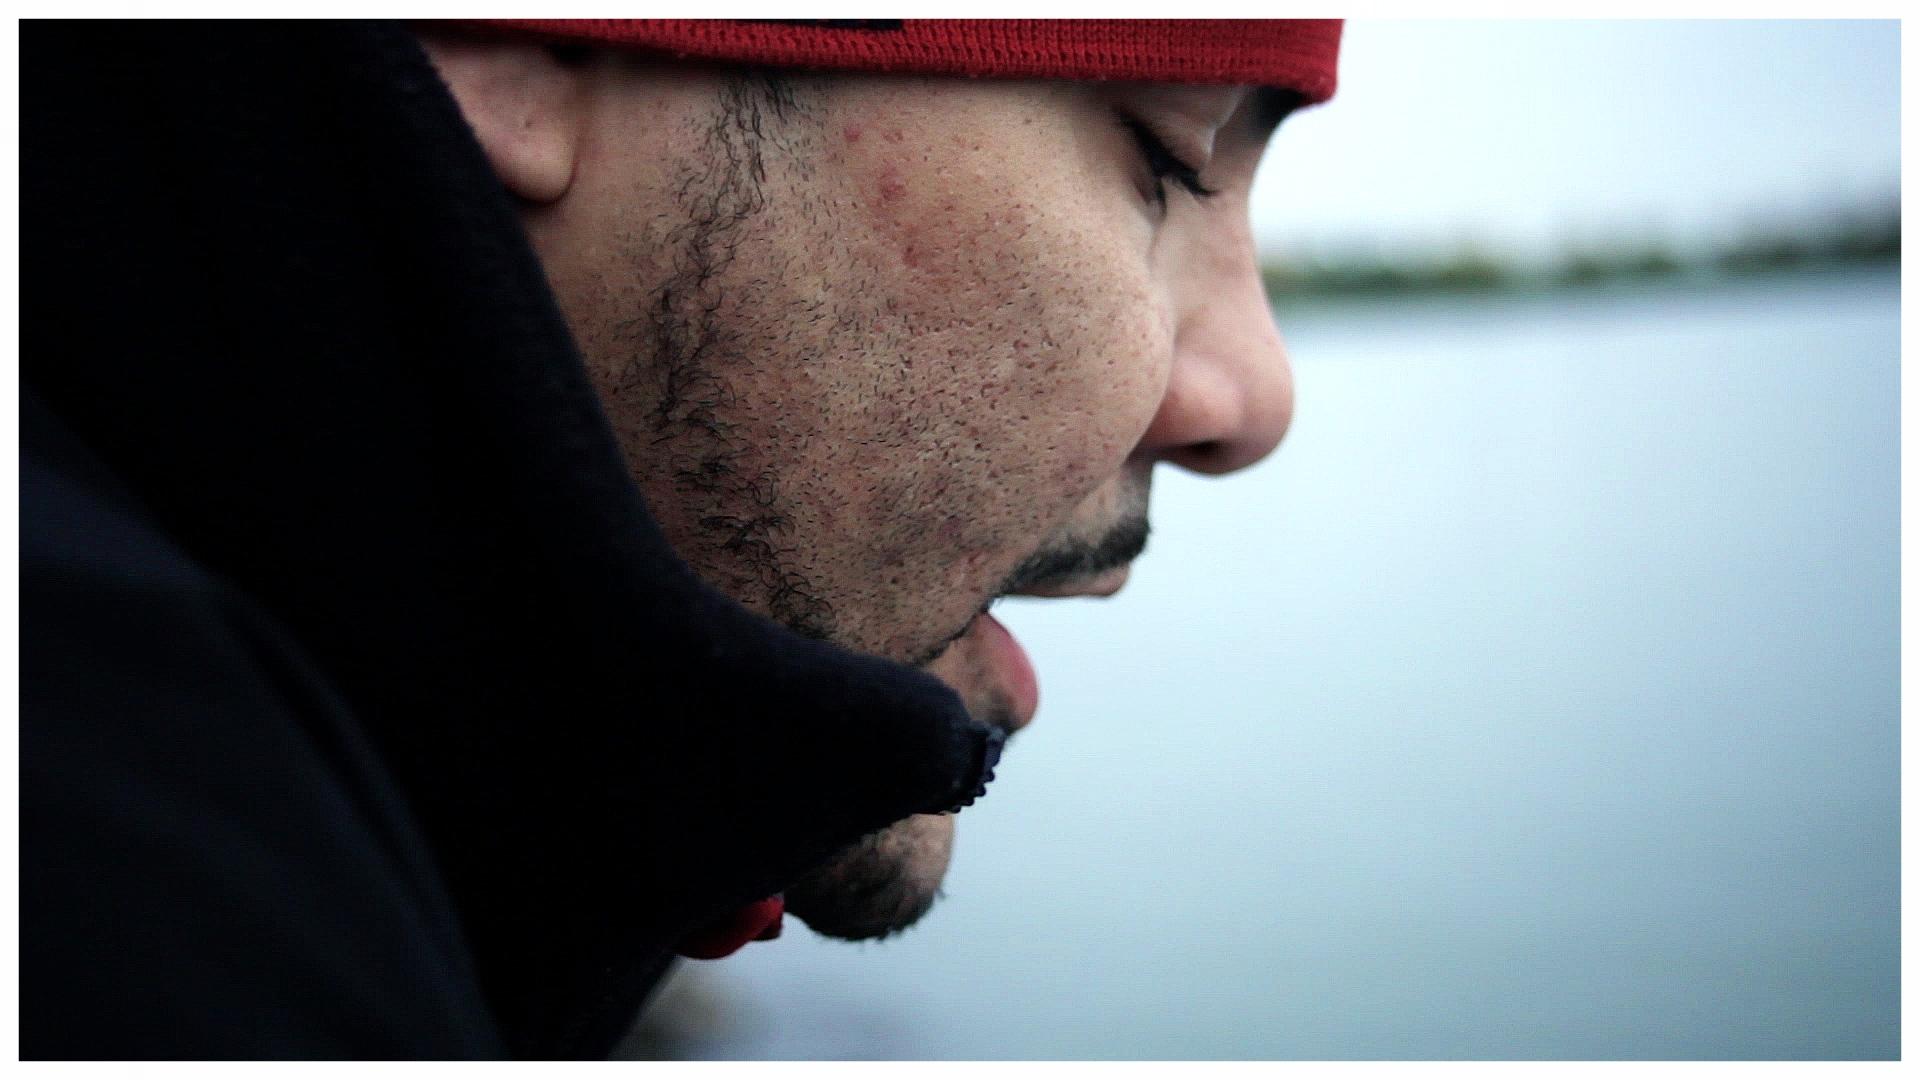 I_Am_Eric_Jaskolski_Lake_Michigan_2.jpg